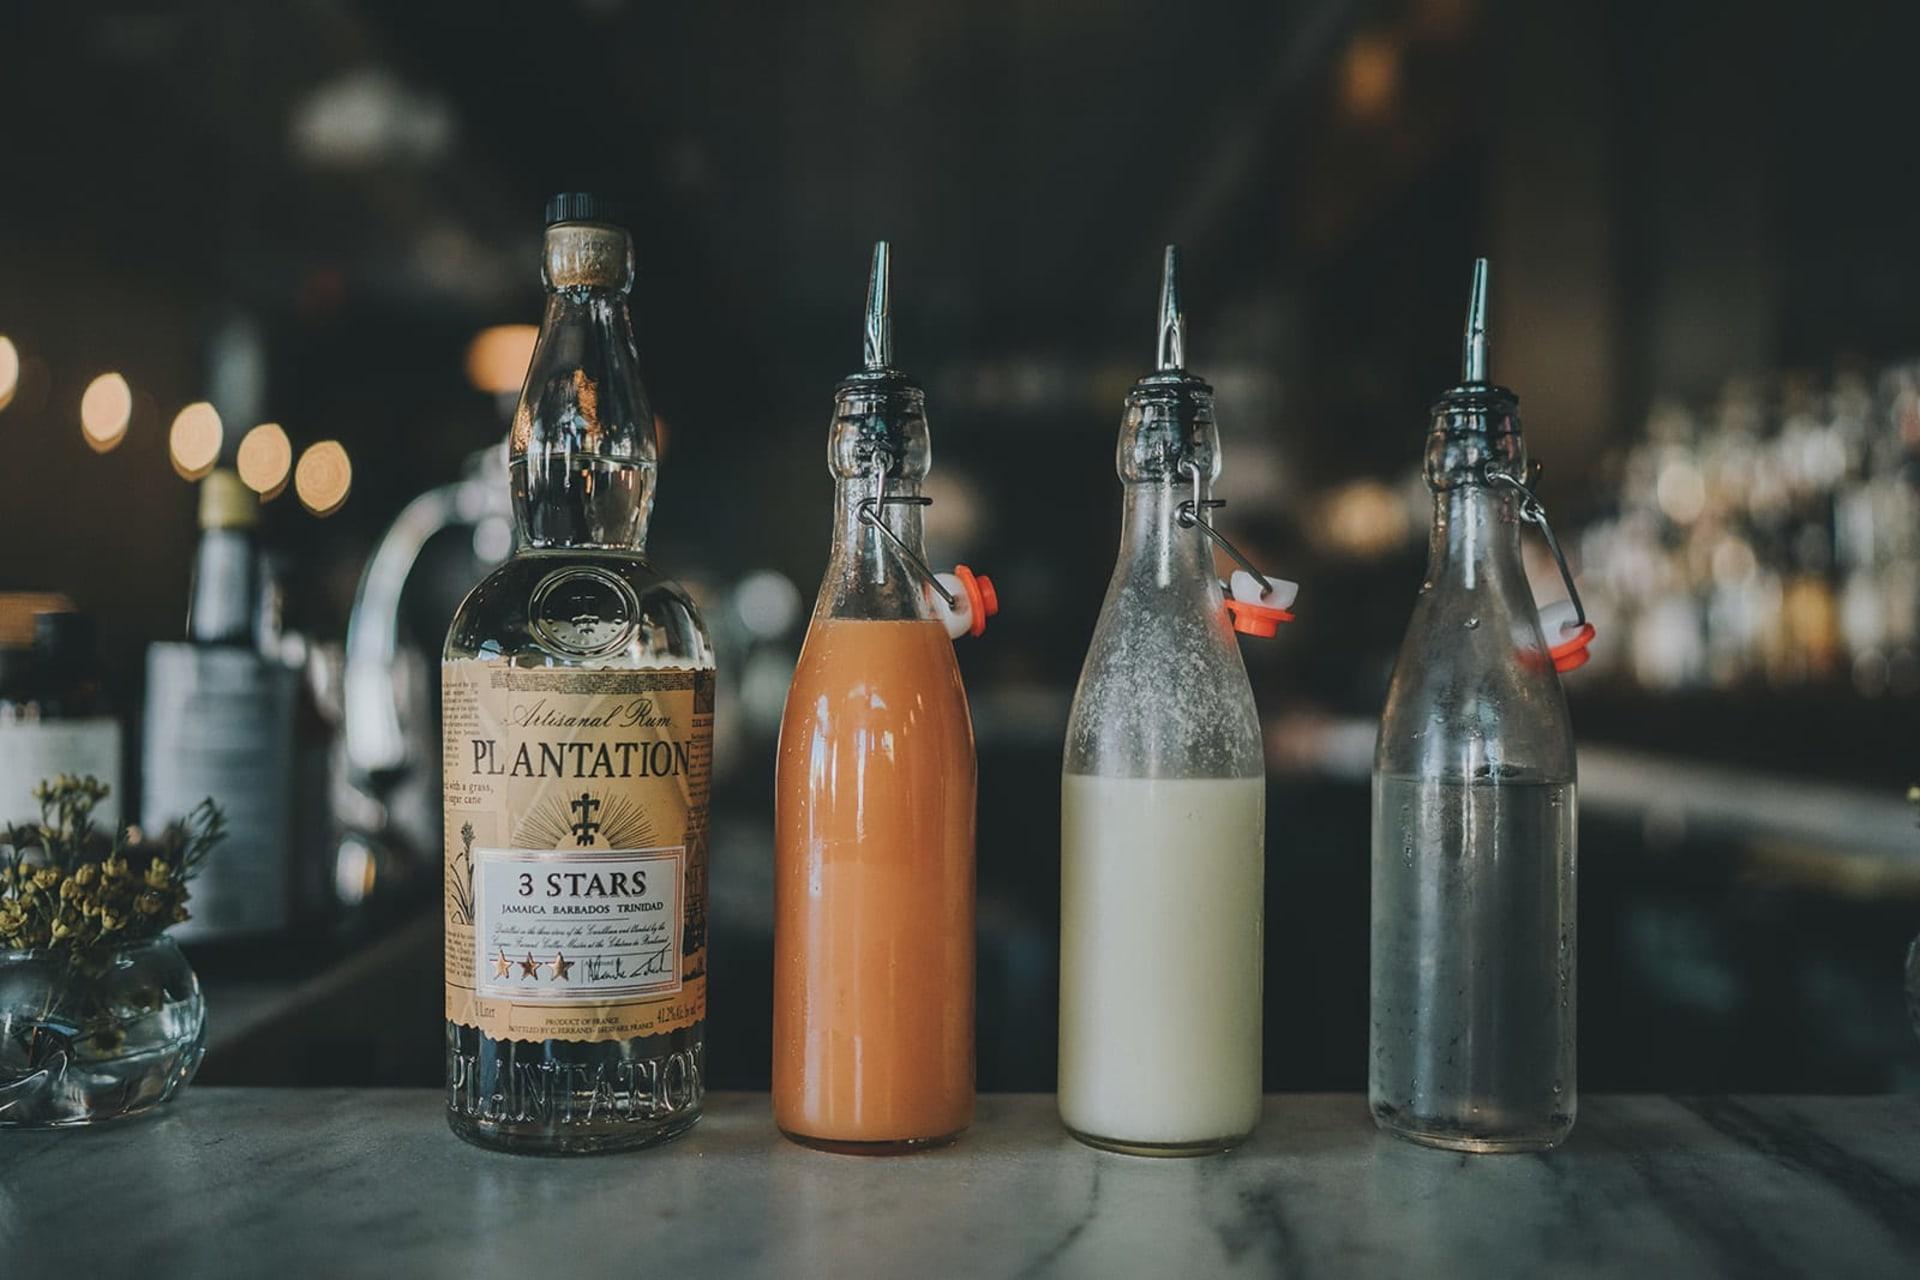 liquor and mixers